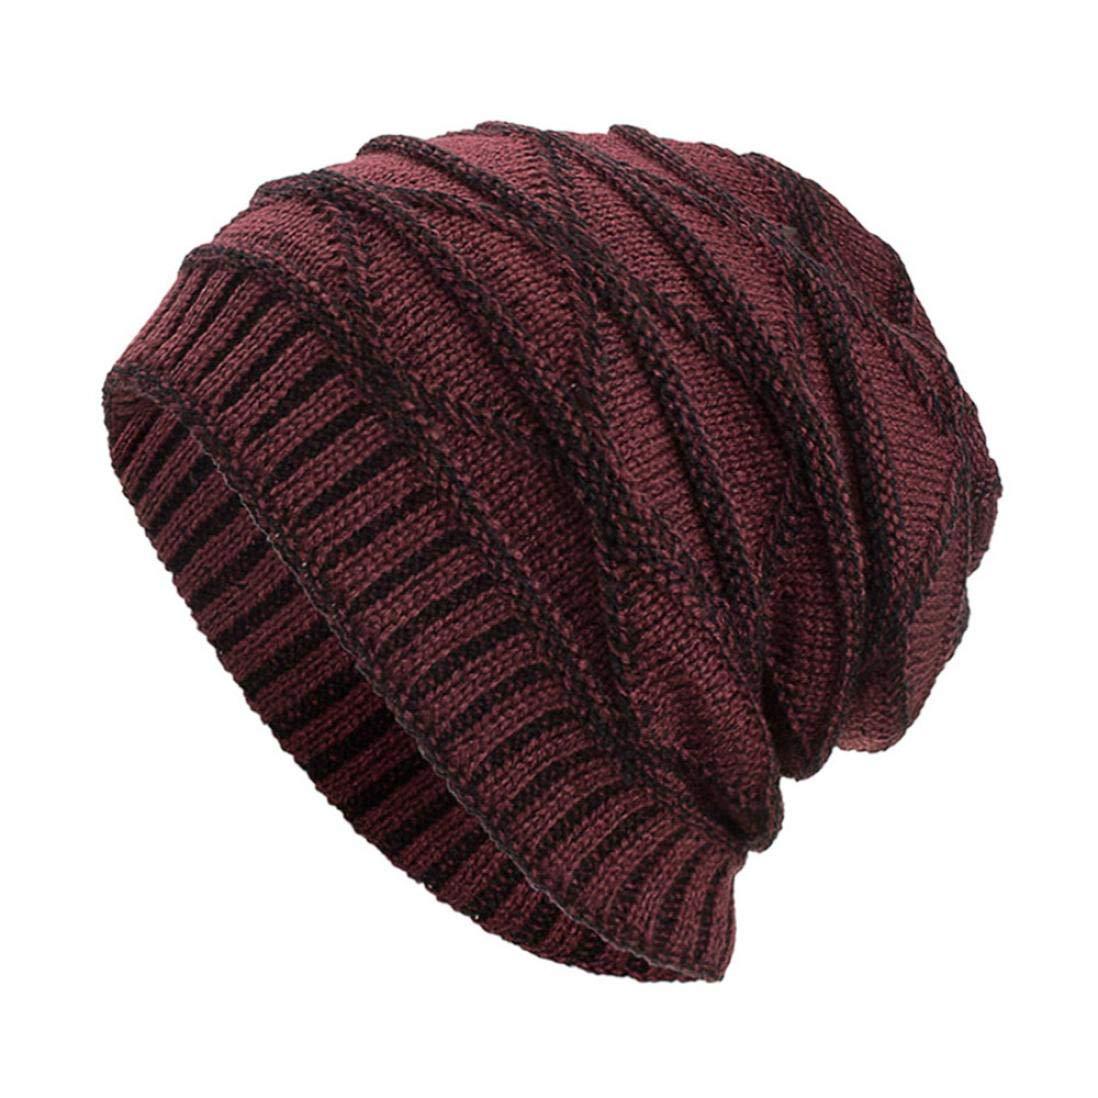 6b3452b6c5f Get Quotations · Tootu Women Men Winter Wool Knit Ski Beanie Skull Caps Hat